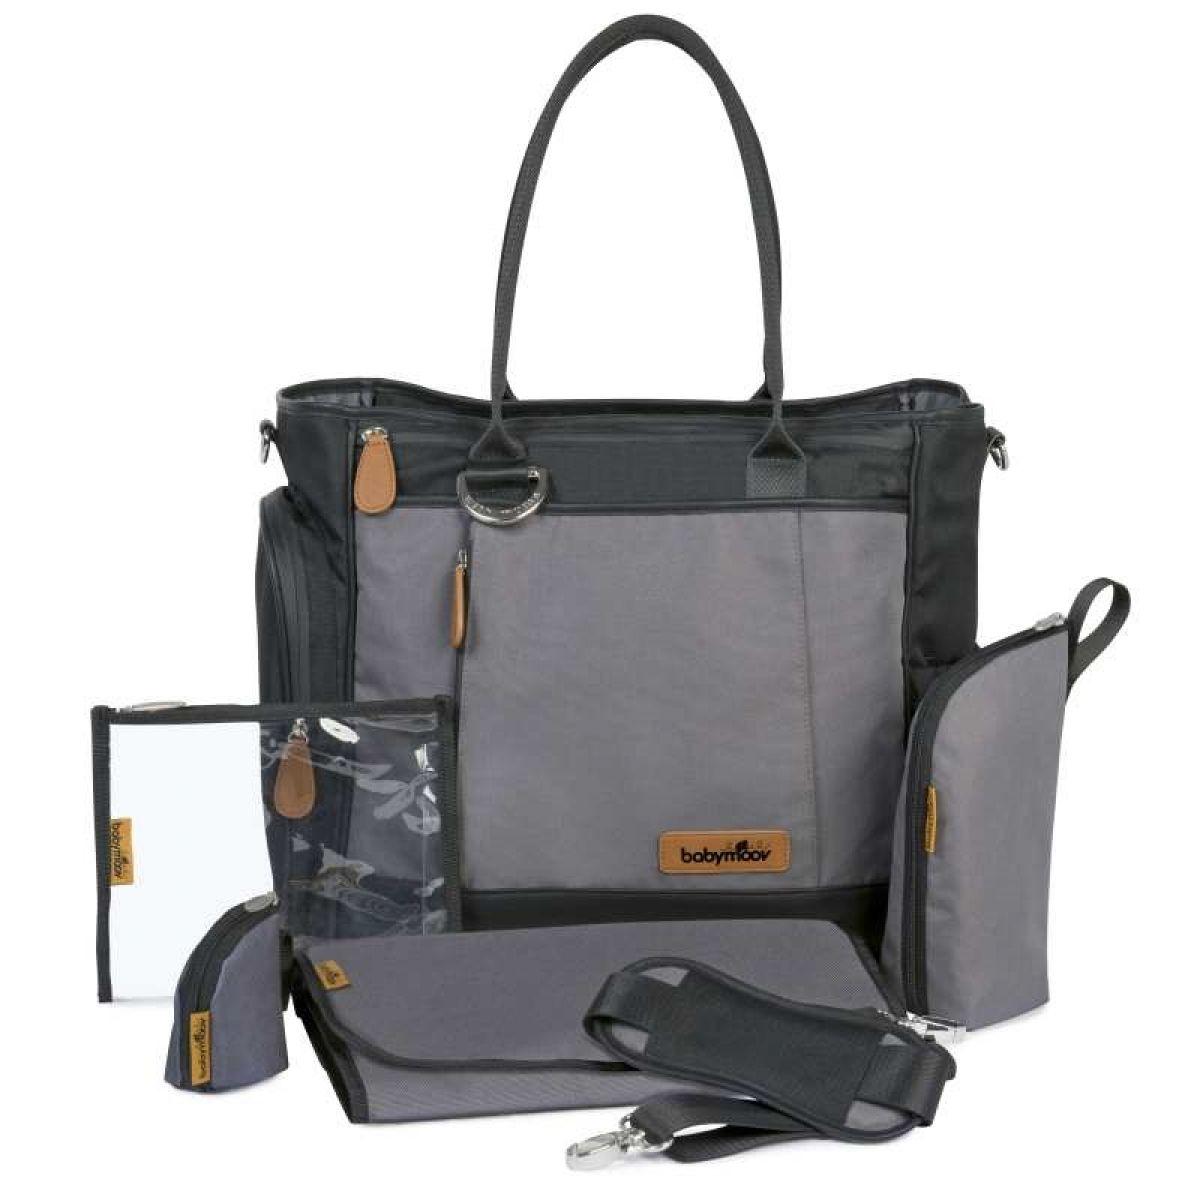 Babymoov Essential Bag Black